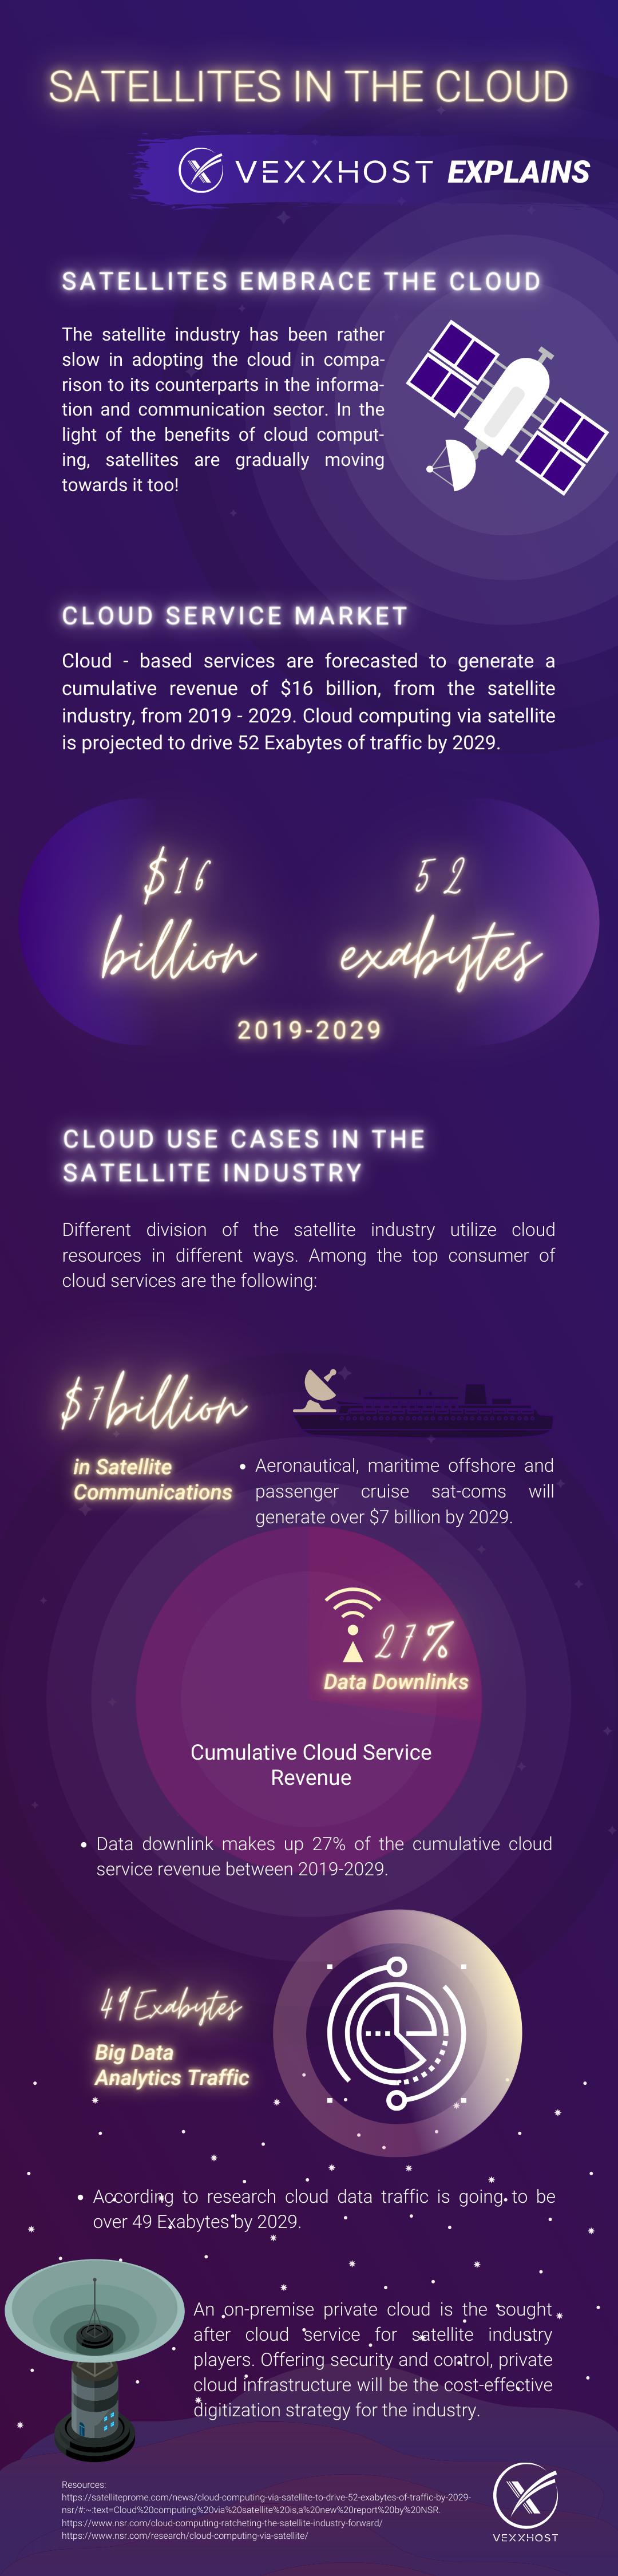 Satellites in the Cloud